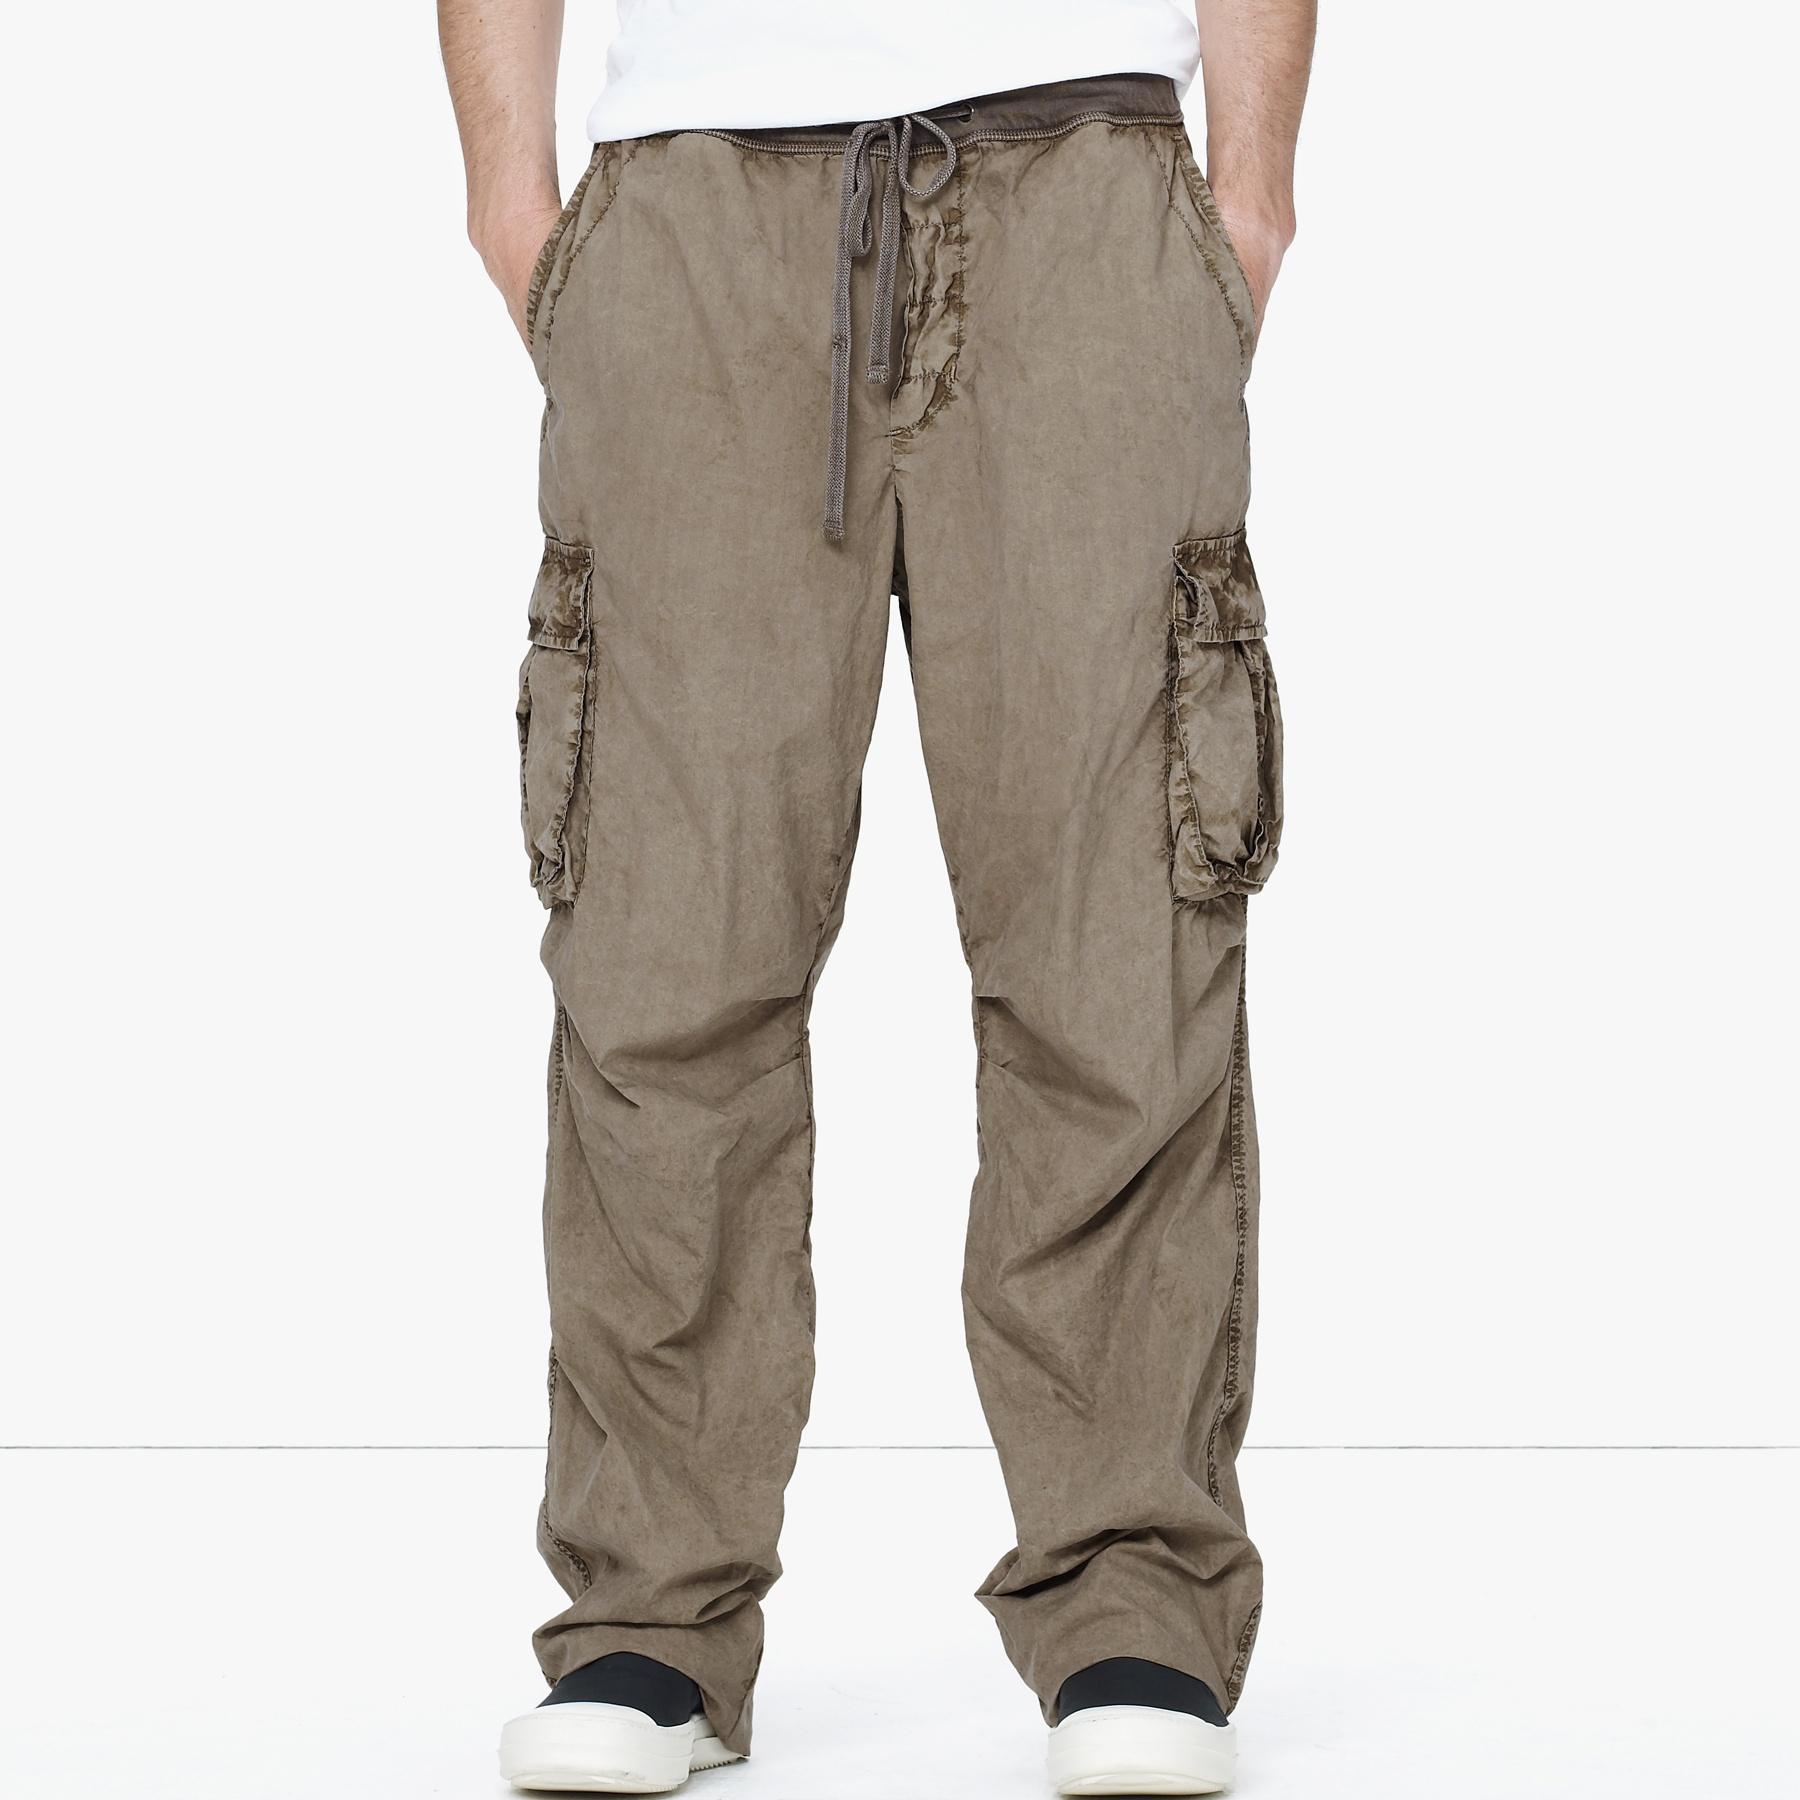 Mens Cotton Cargo Pants James Perse vgKoXCB